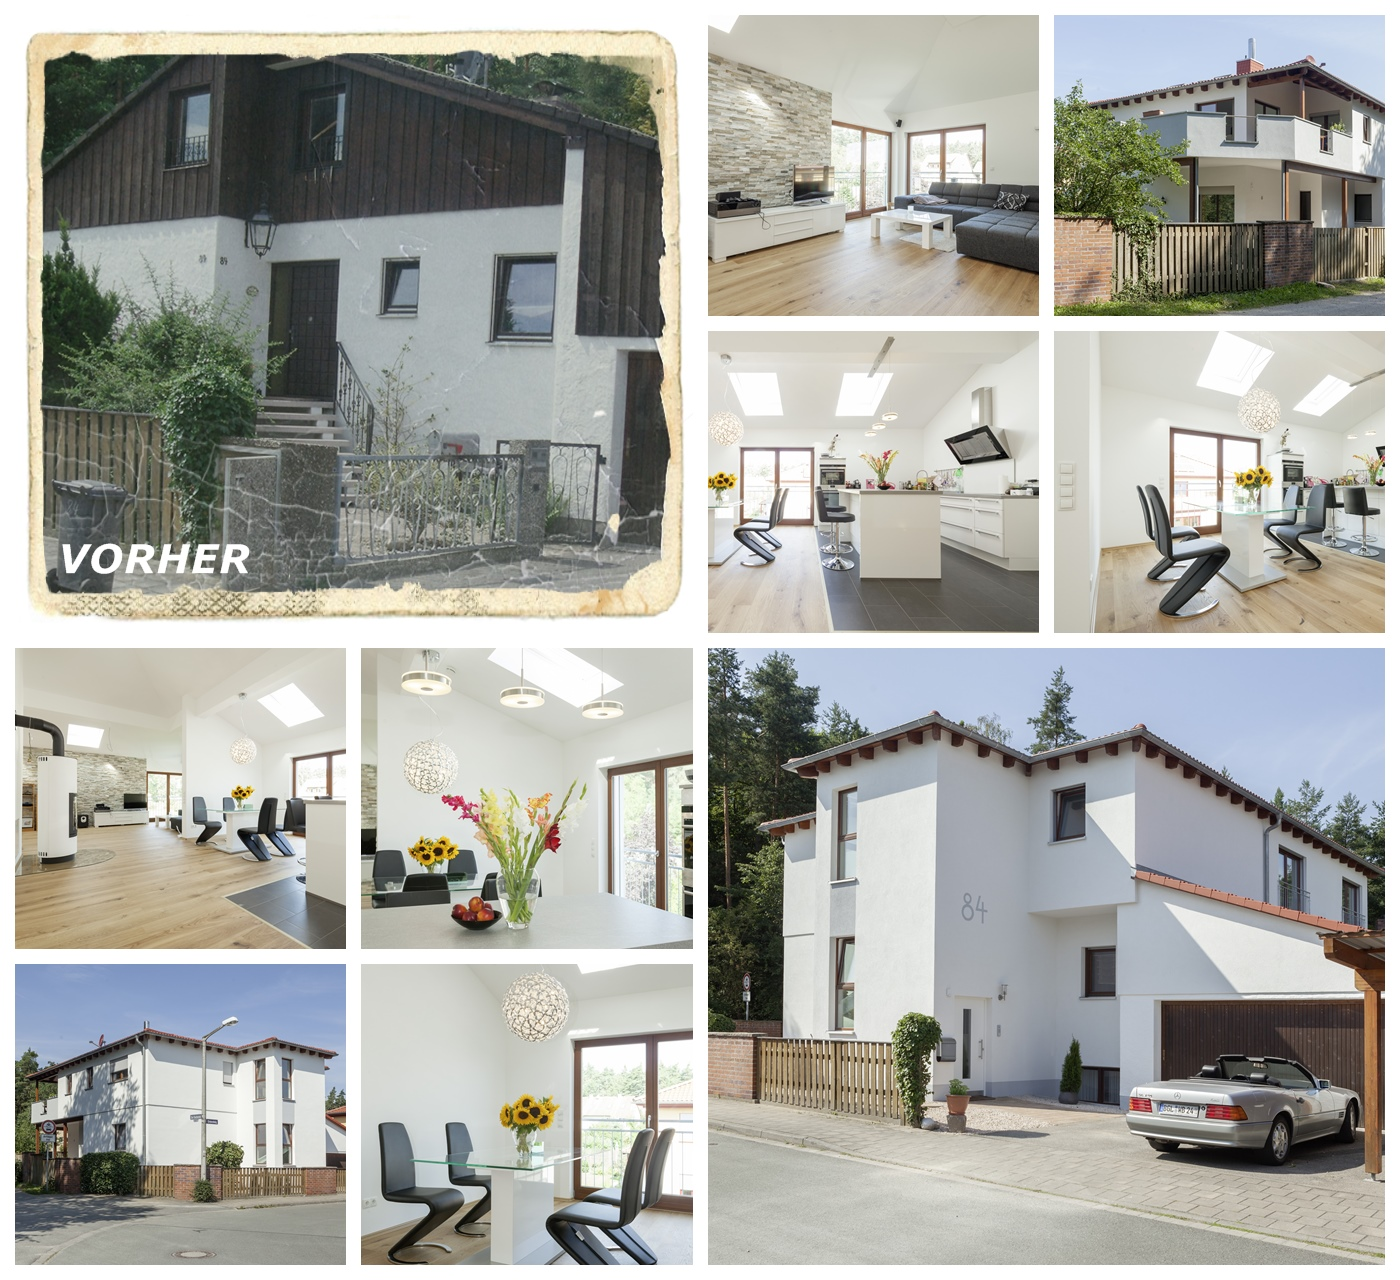 WOLF-Musterhaus Bad Vilbel | Aufstockung und Umbau